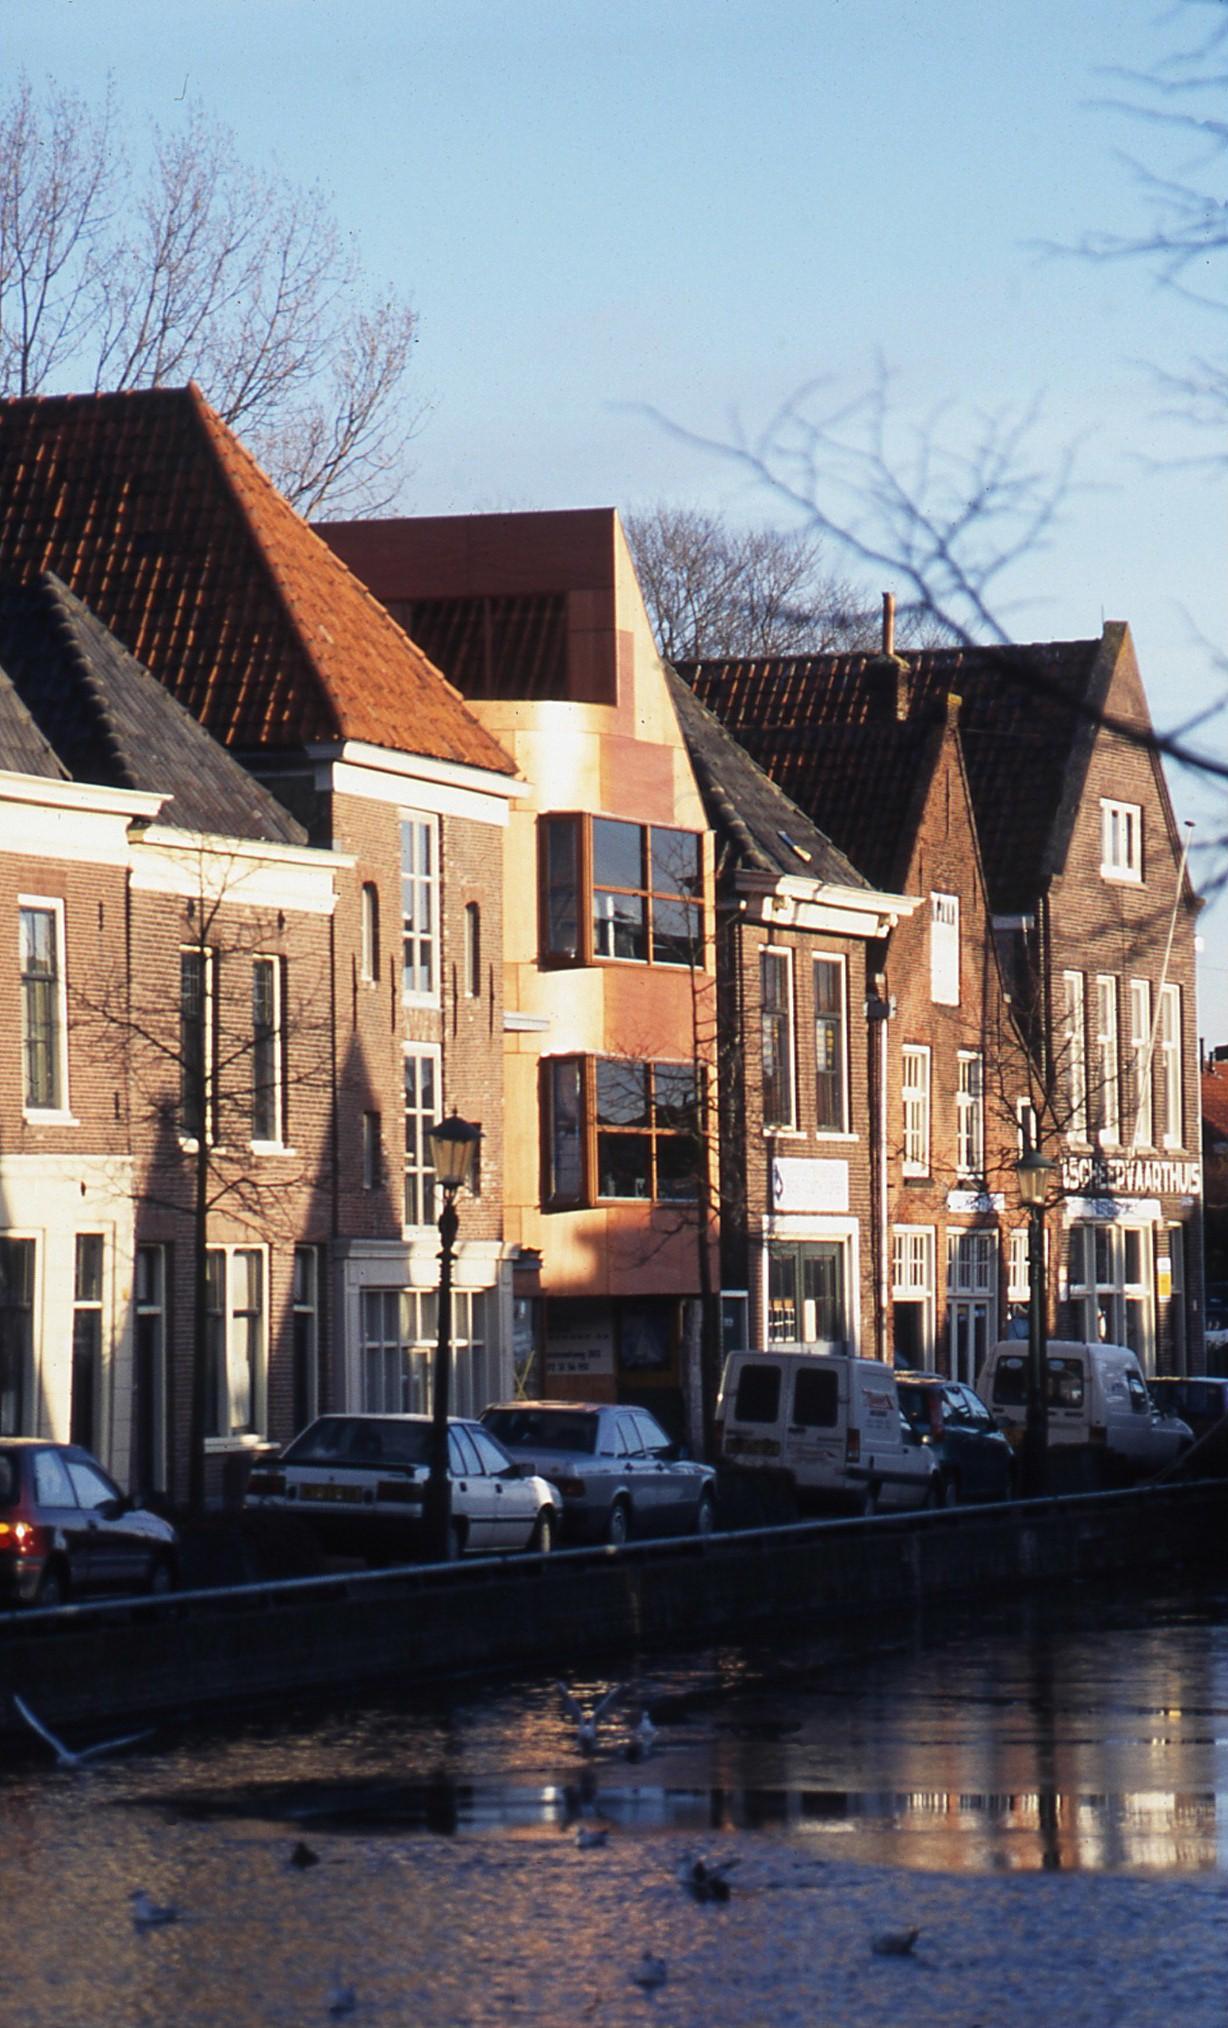 Twee woningen, Luttik Oudorp - Alkmaar